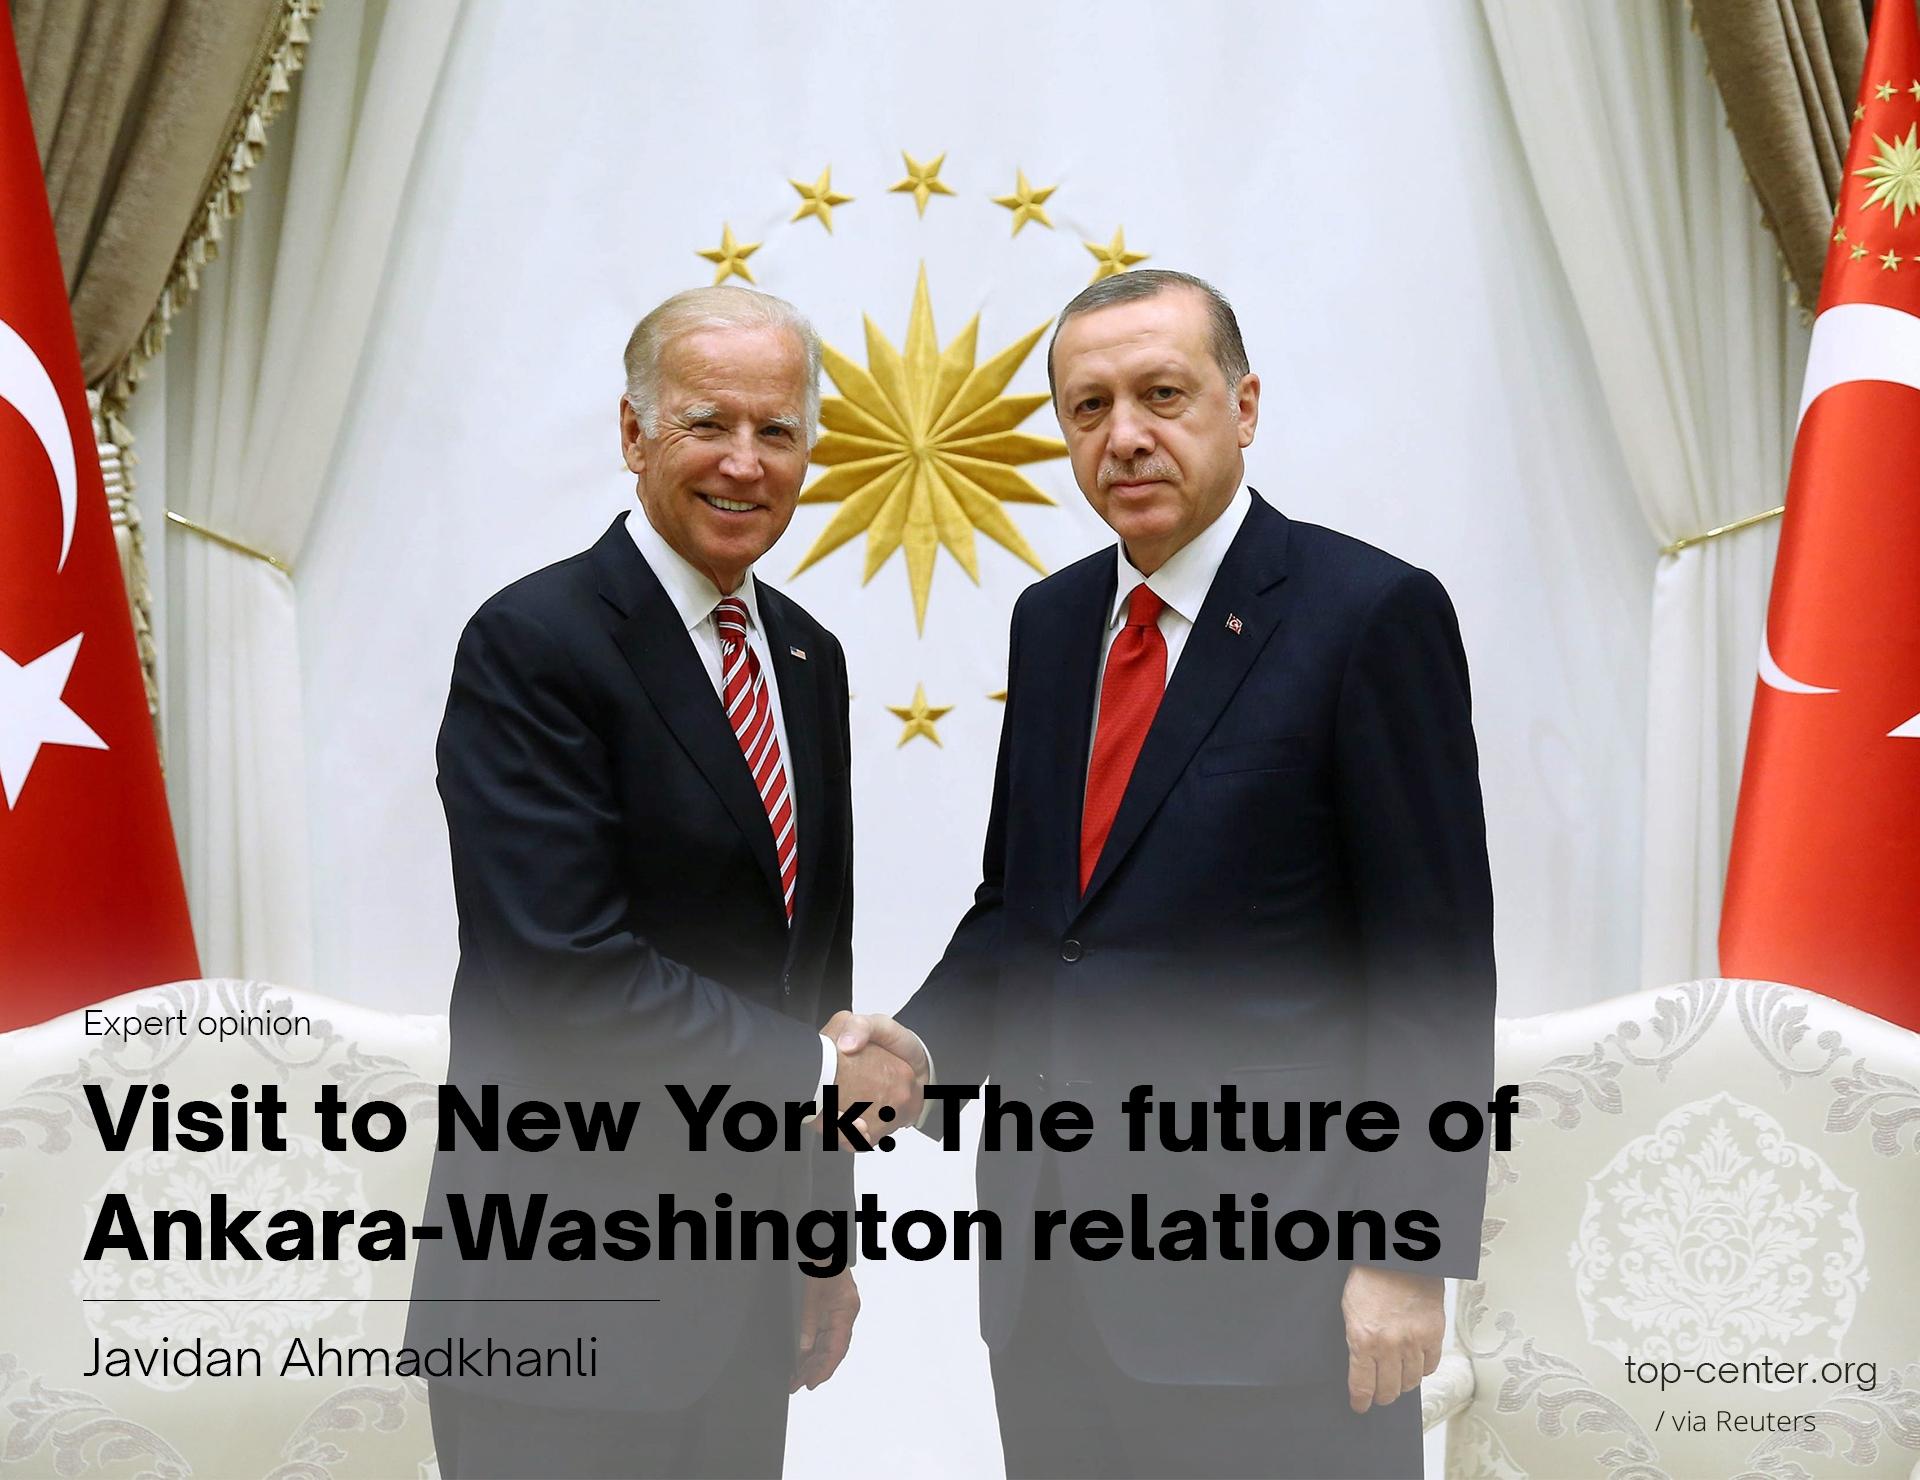 Visit to New York: The future of Ankara-Washington relations